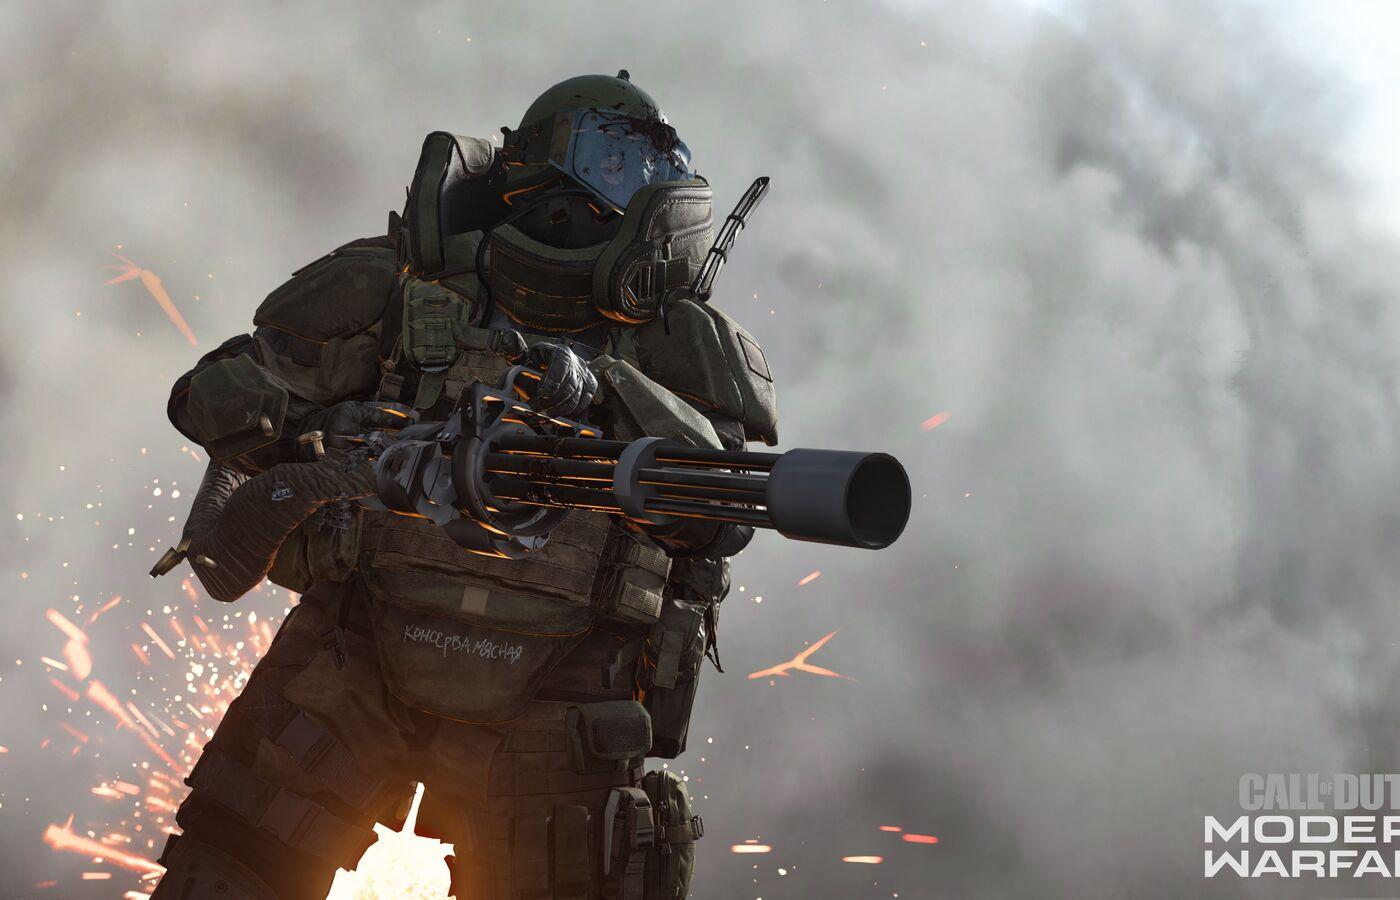 call-of-duty-modern-warfare-4k-2019-md.jpg